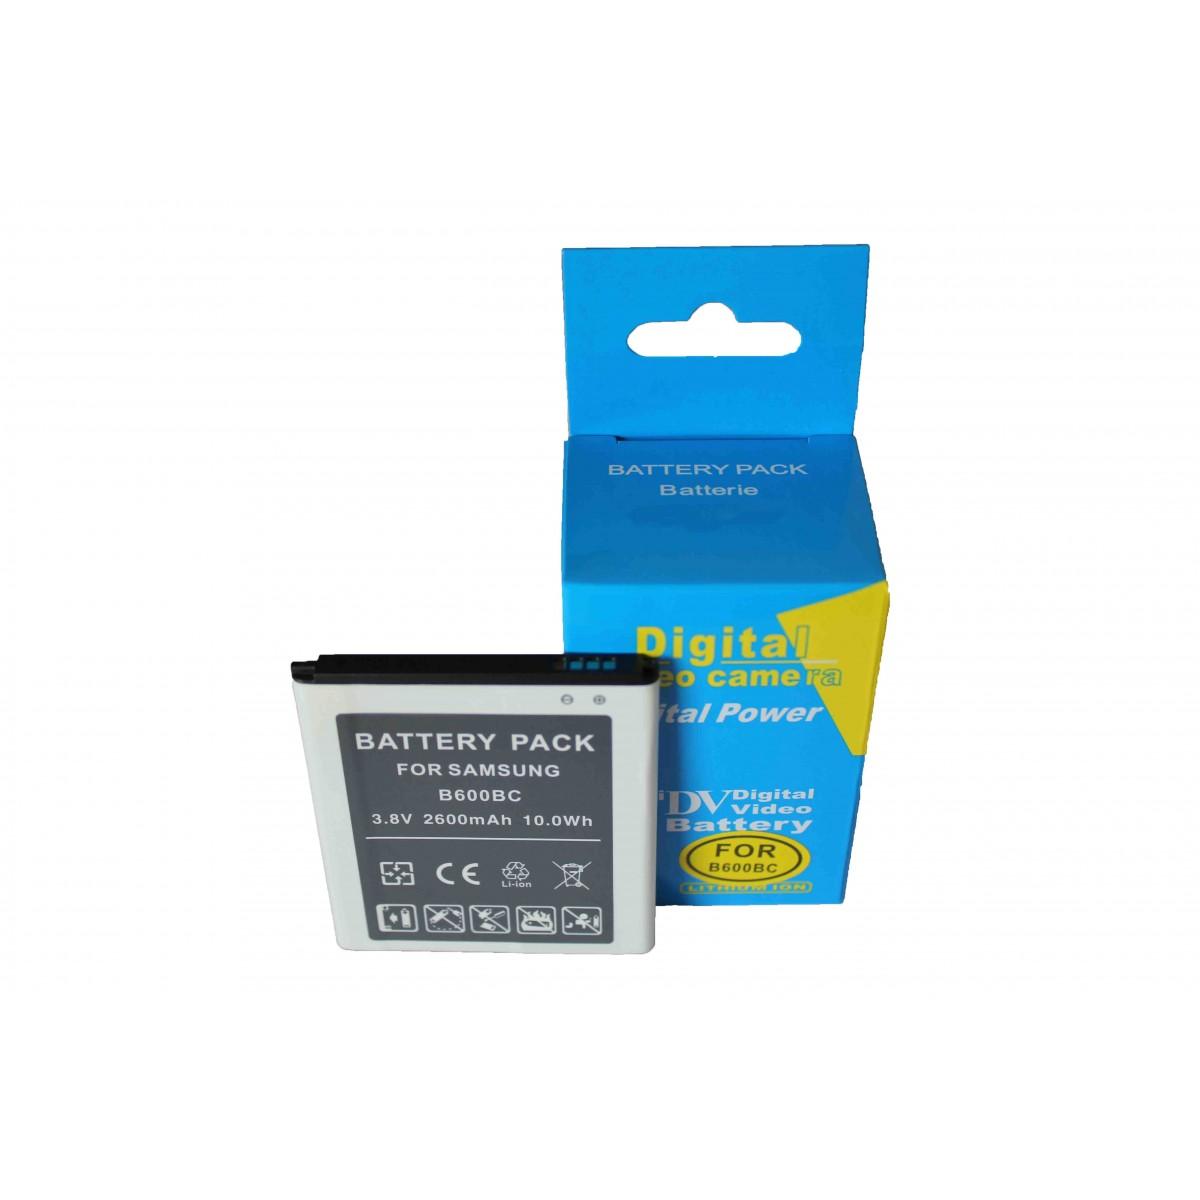 BATERIA B600BC SAMSUNG GALAXY S4 I9500 I9505